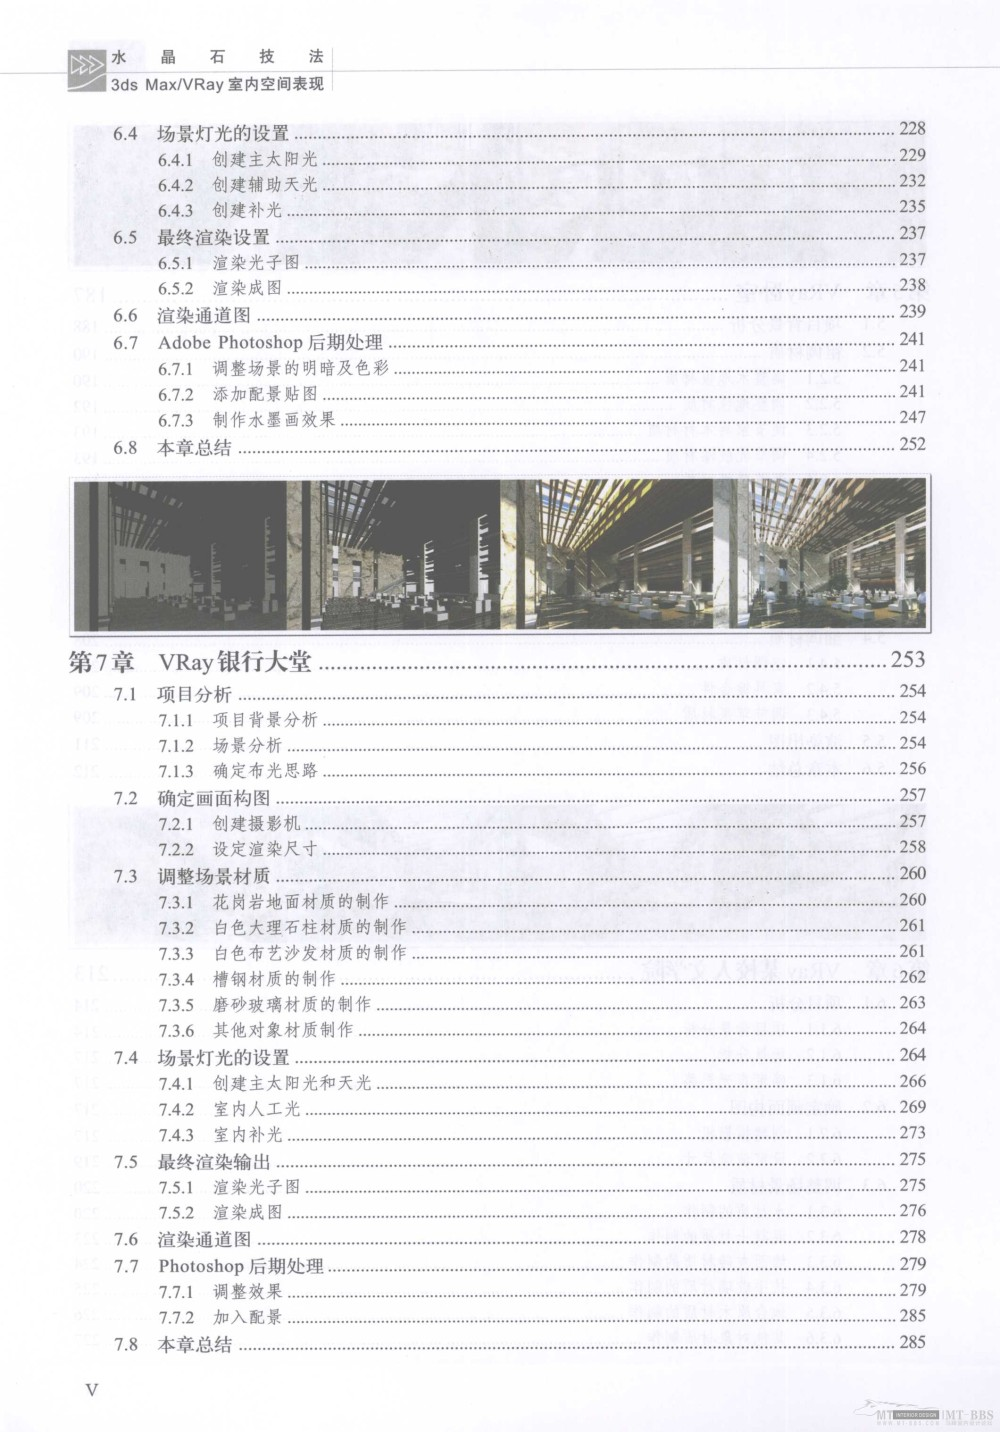 水晶石技法-3ds_Max&VRay室内空间表现_水晶石技法-3ds_Max&VRay室内空间表现_页面_006.jpg